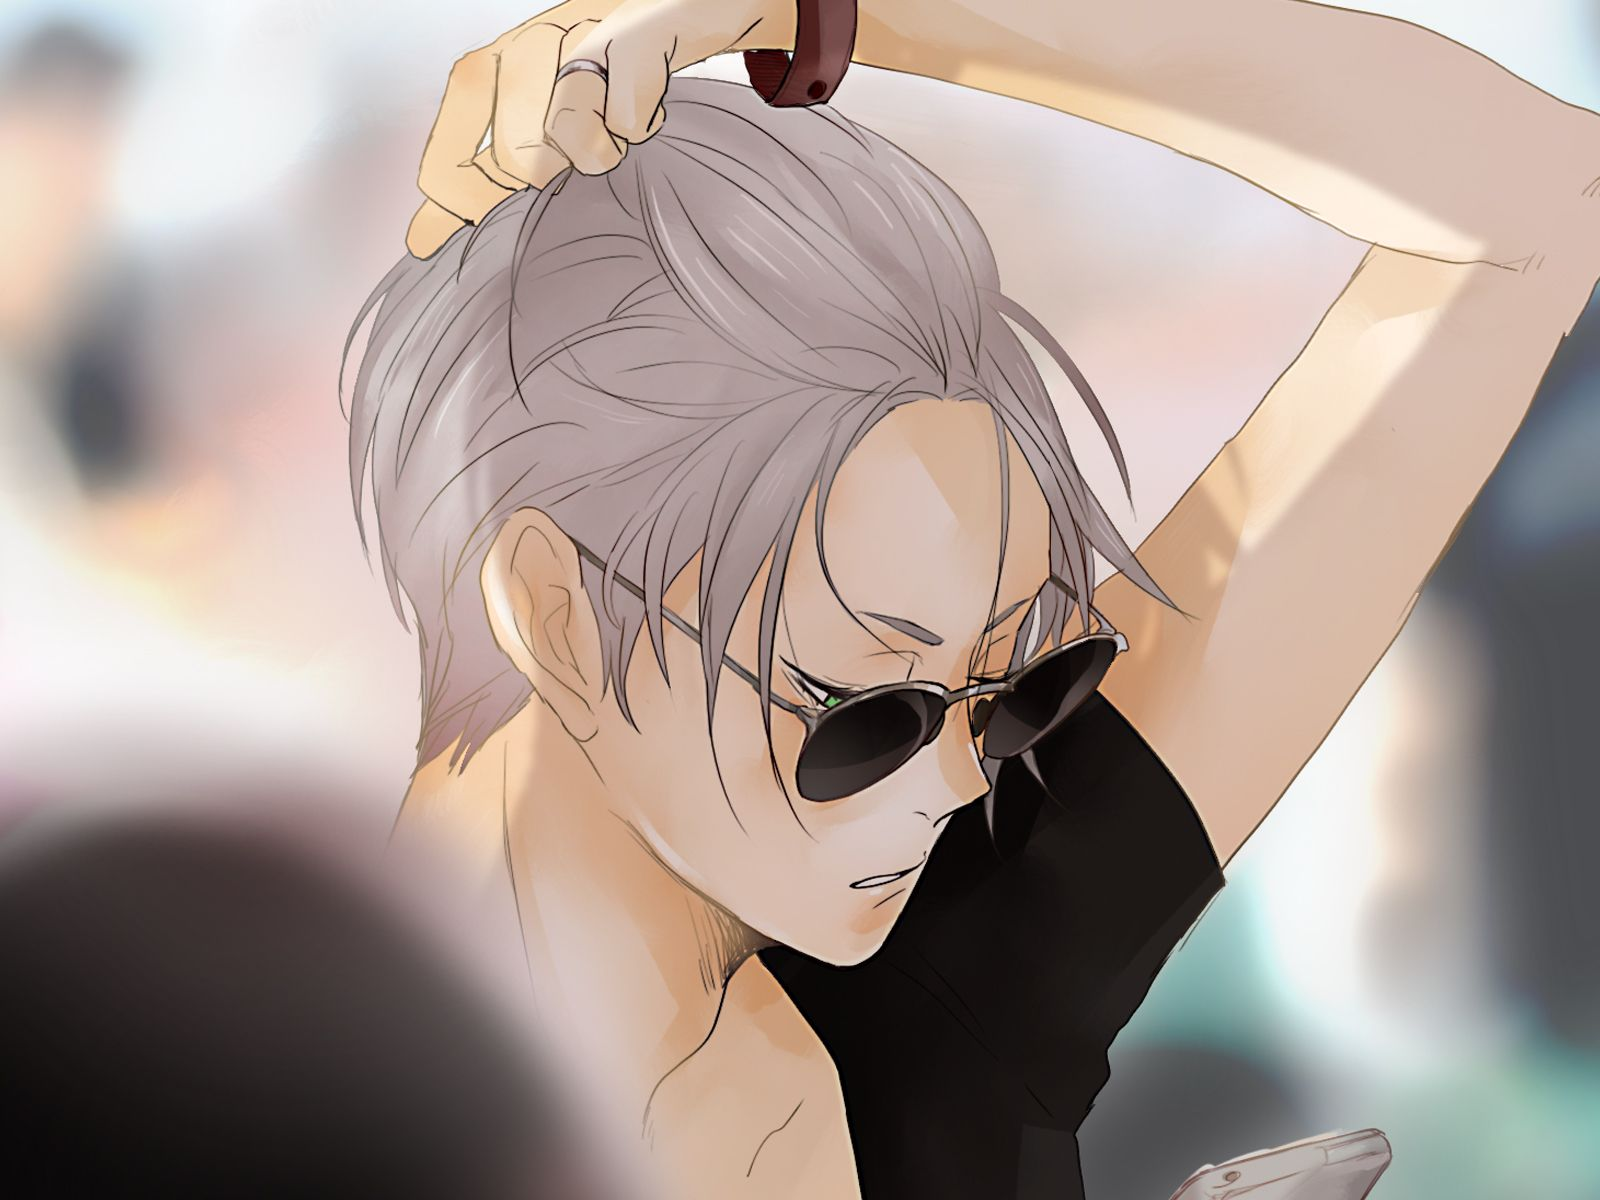 Pin by sakura yuuki on my anime hot guys collection pinterest